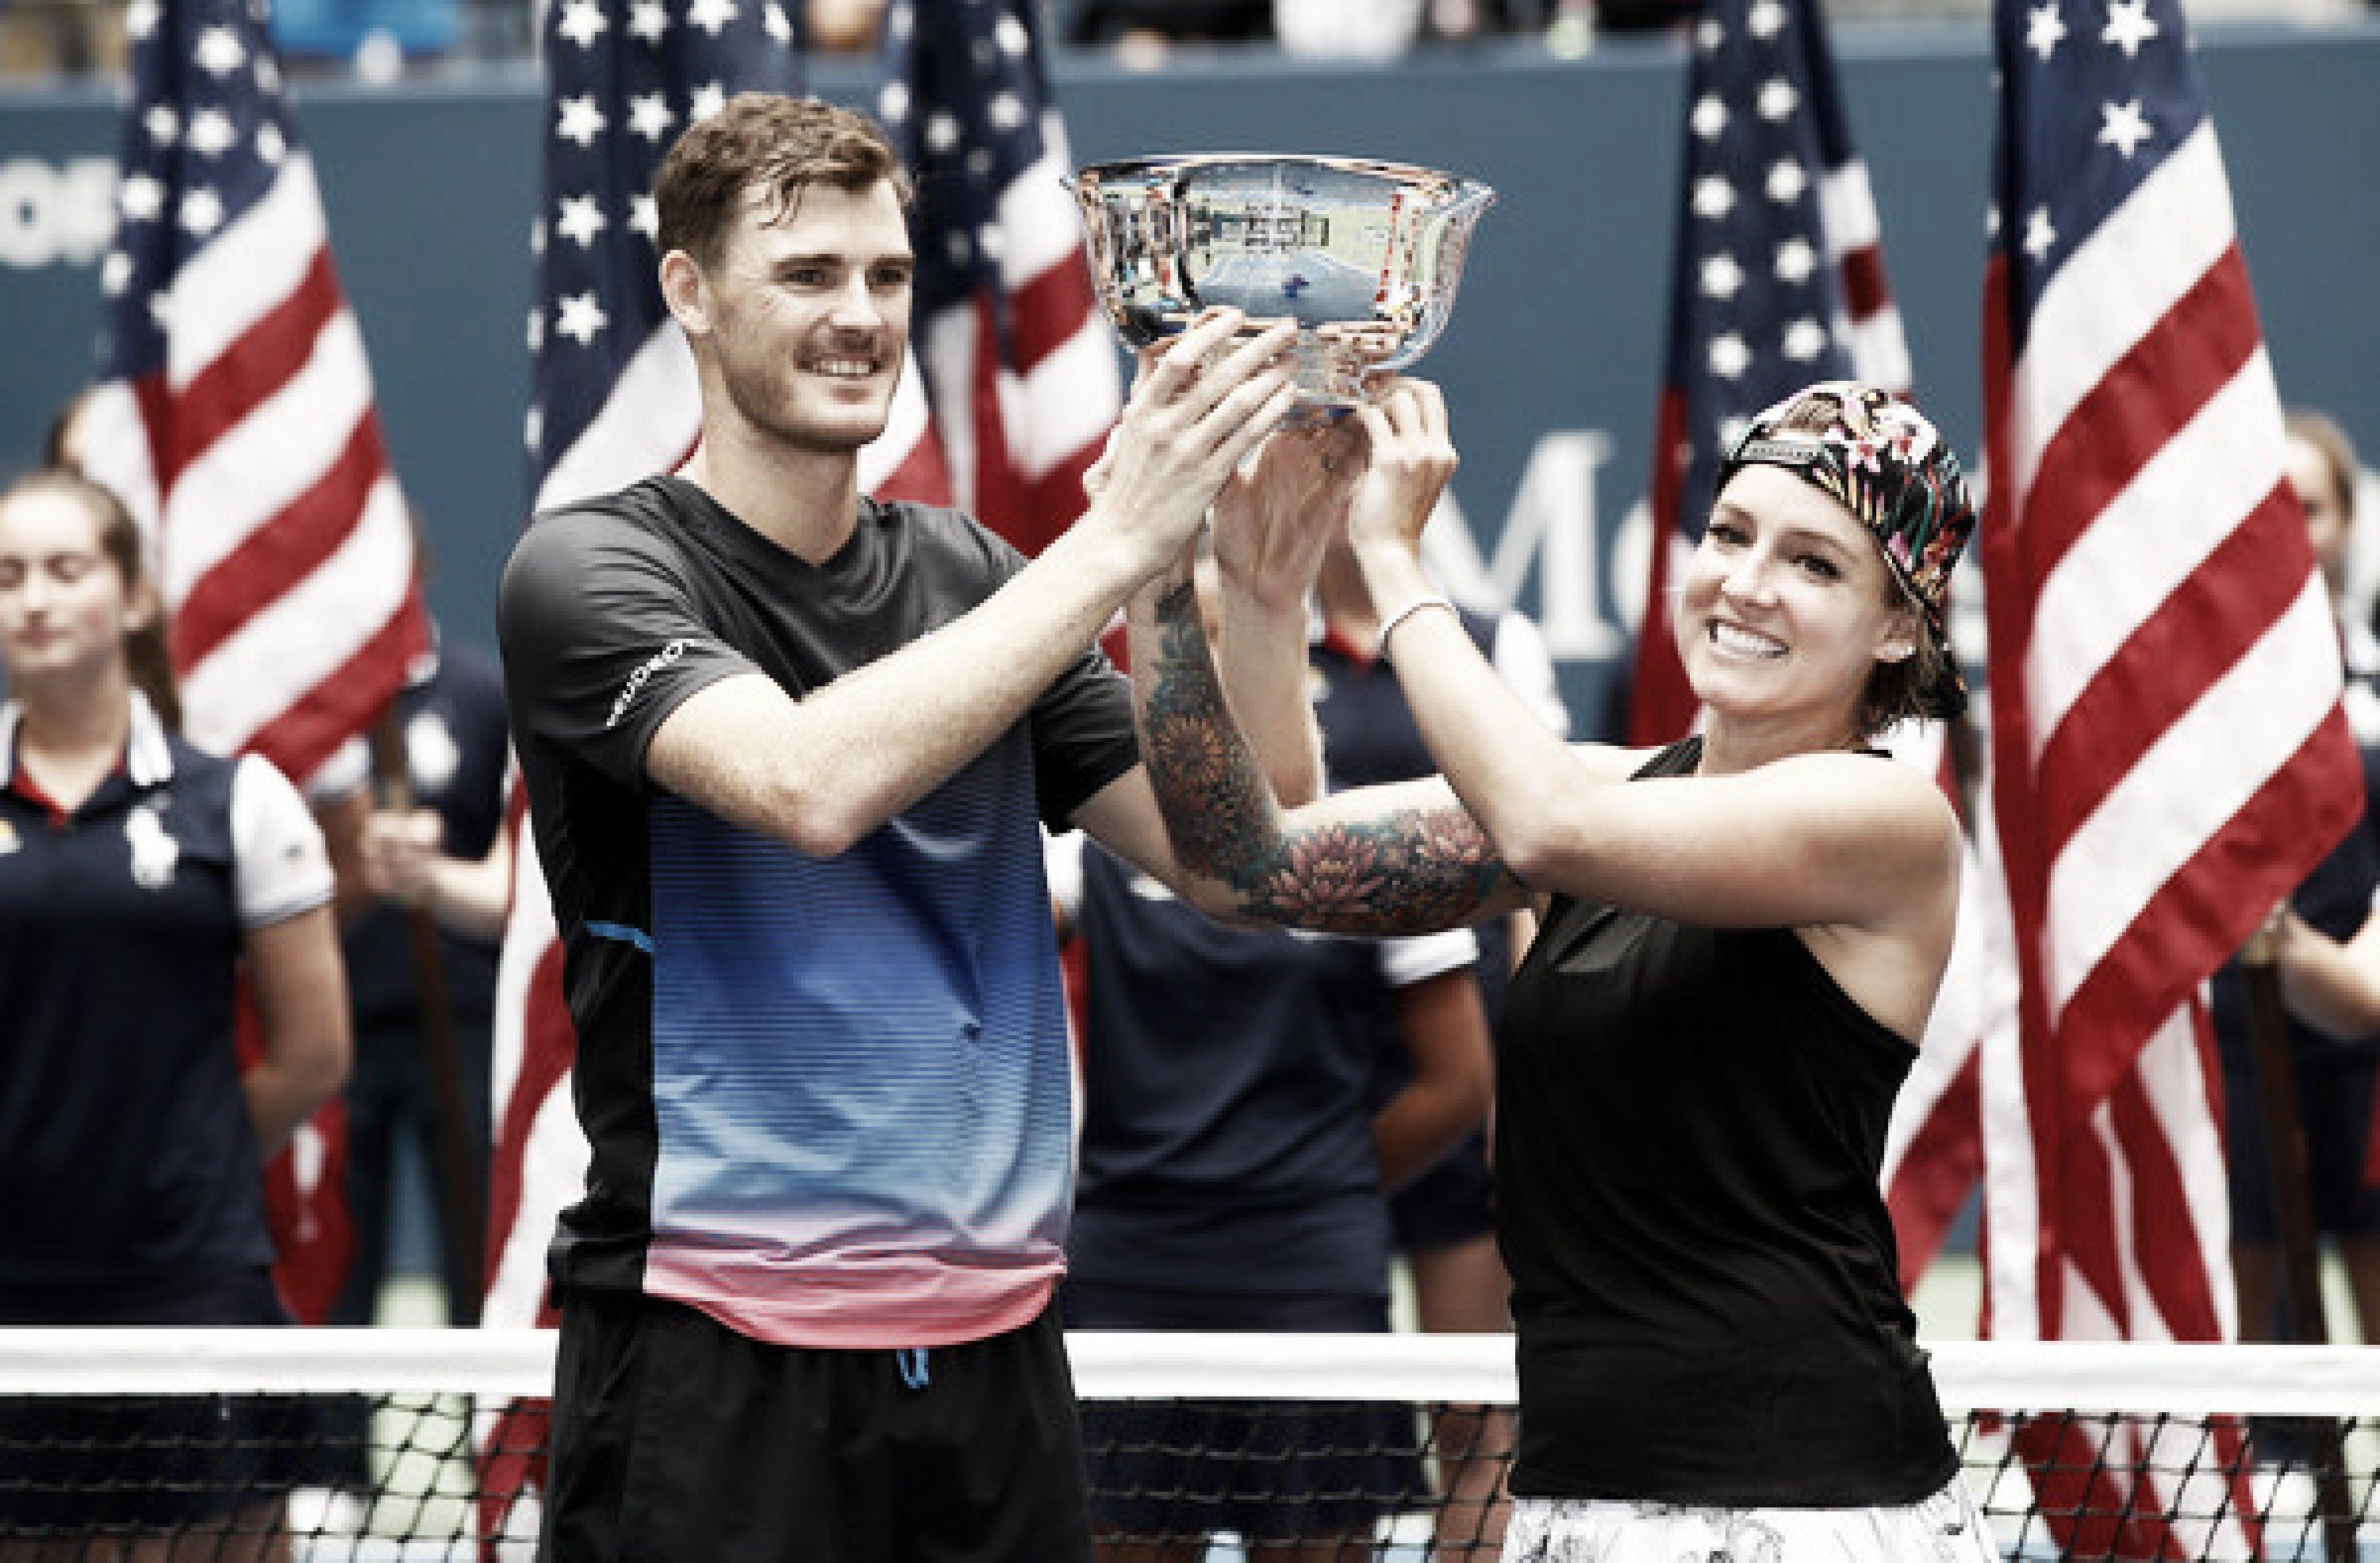 Murray y Mattek Sands reinan en el dobles mixto del US Open